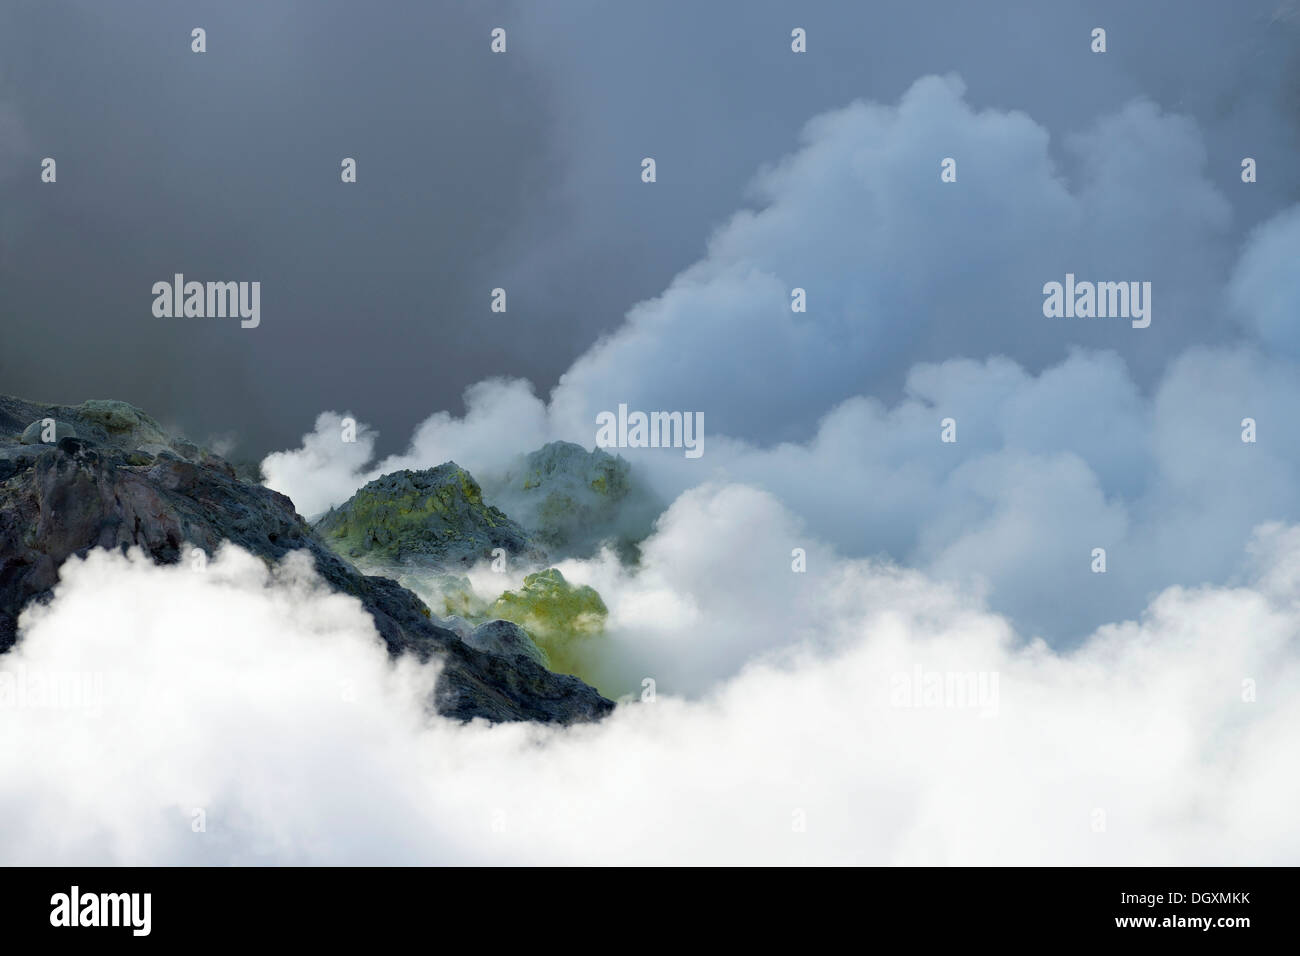 Fumaroles, geothermal active region, Kawayu Onsen, Akan-Nationalpark, Hokkaido, Japan - Stock Image